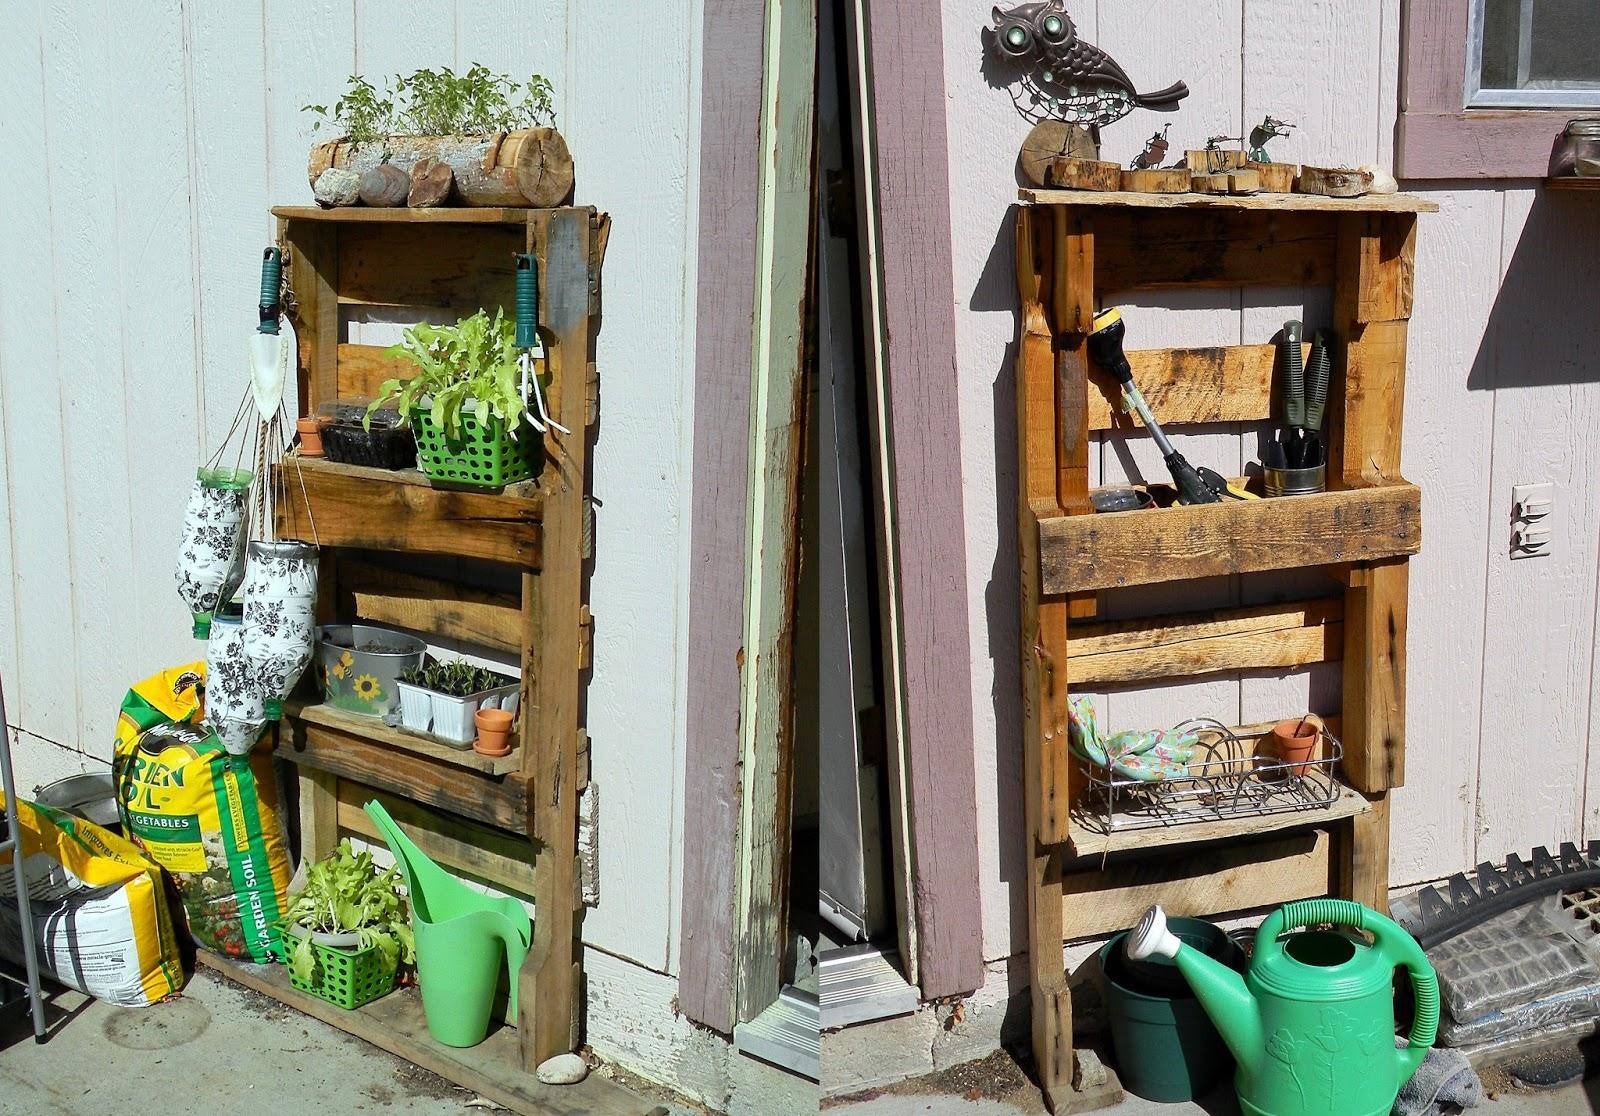 Upcycled Pallet Gardening Shelves   Back Yard